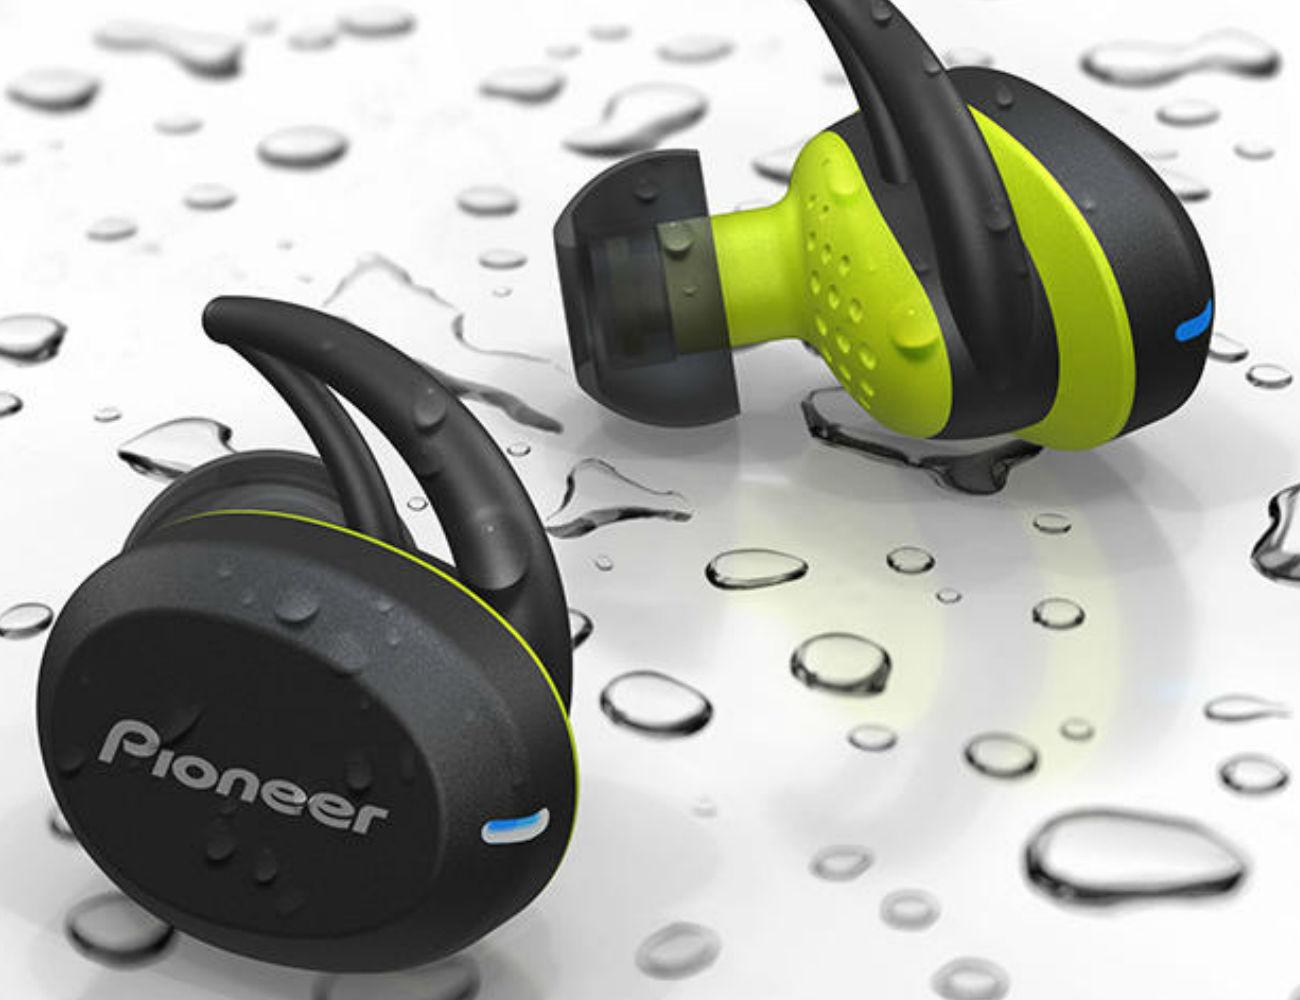 Pioneer E8 Truly Wireless Earbuds